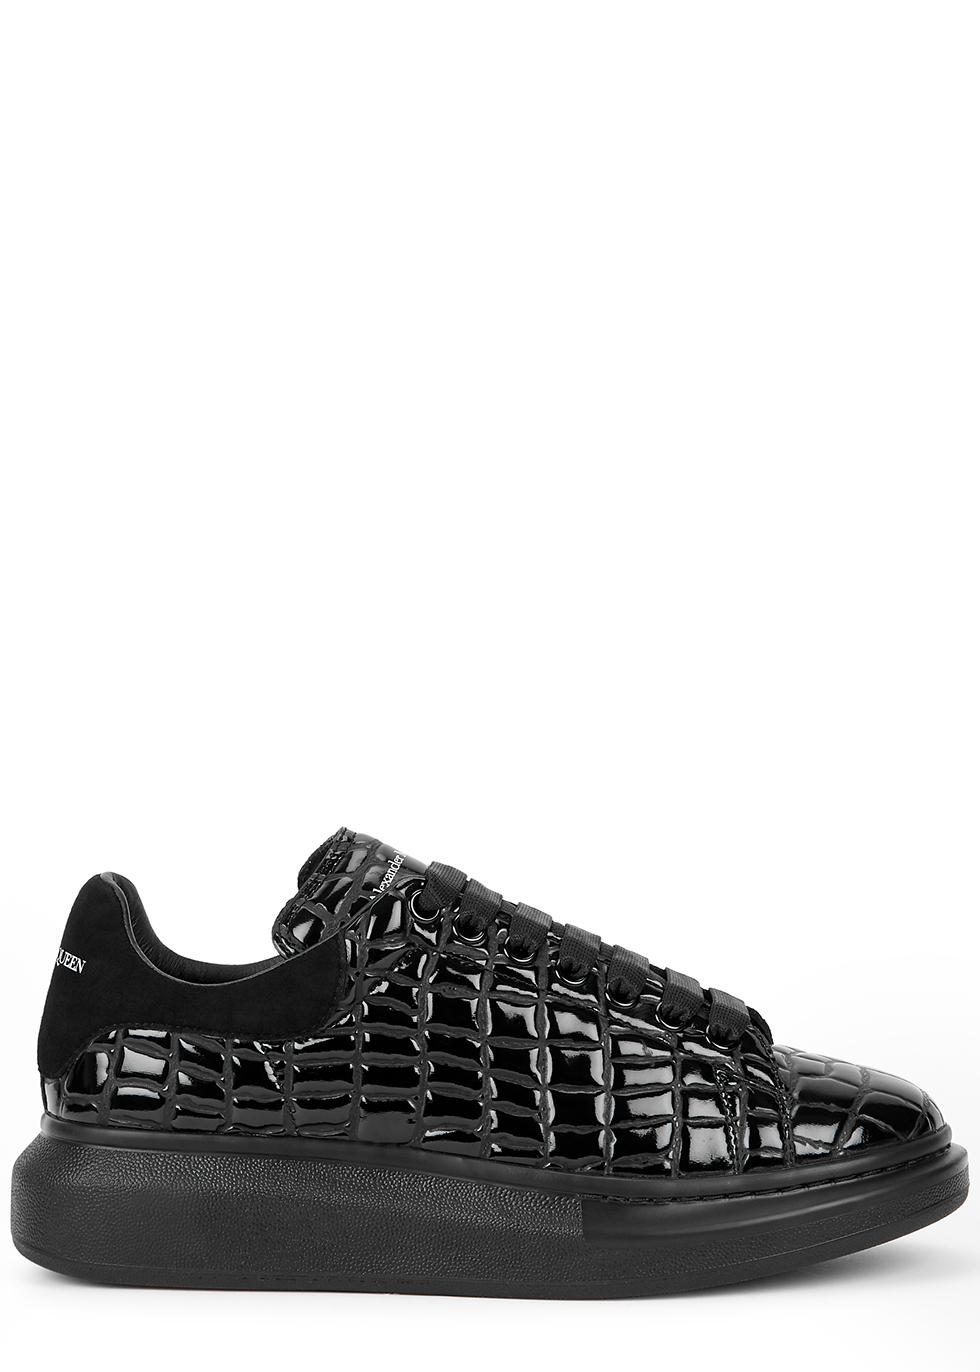 Larry black crocodile-effect leather sneakers